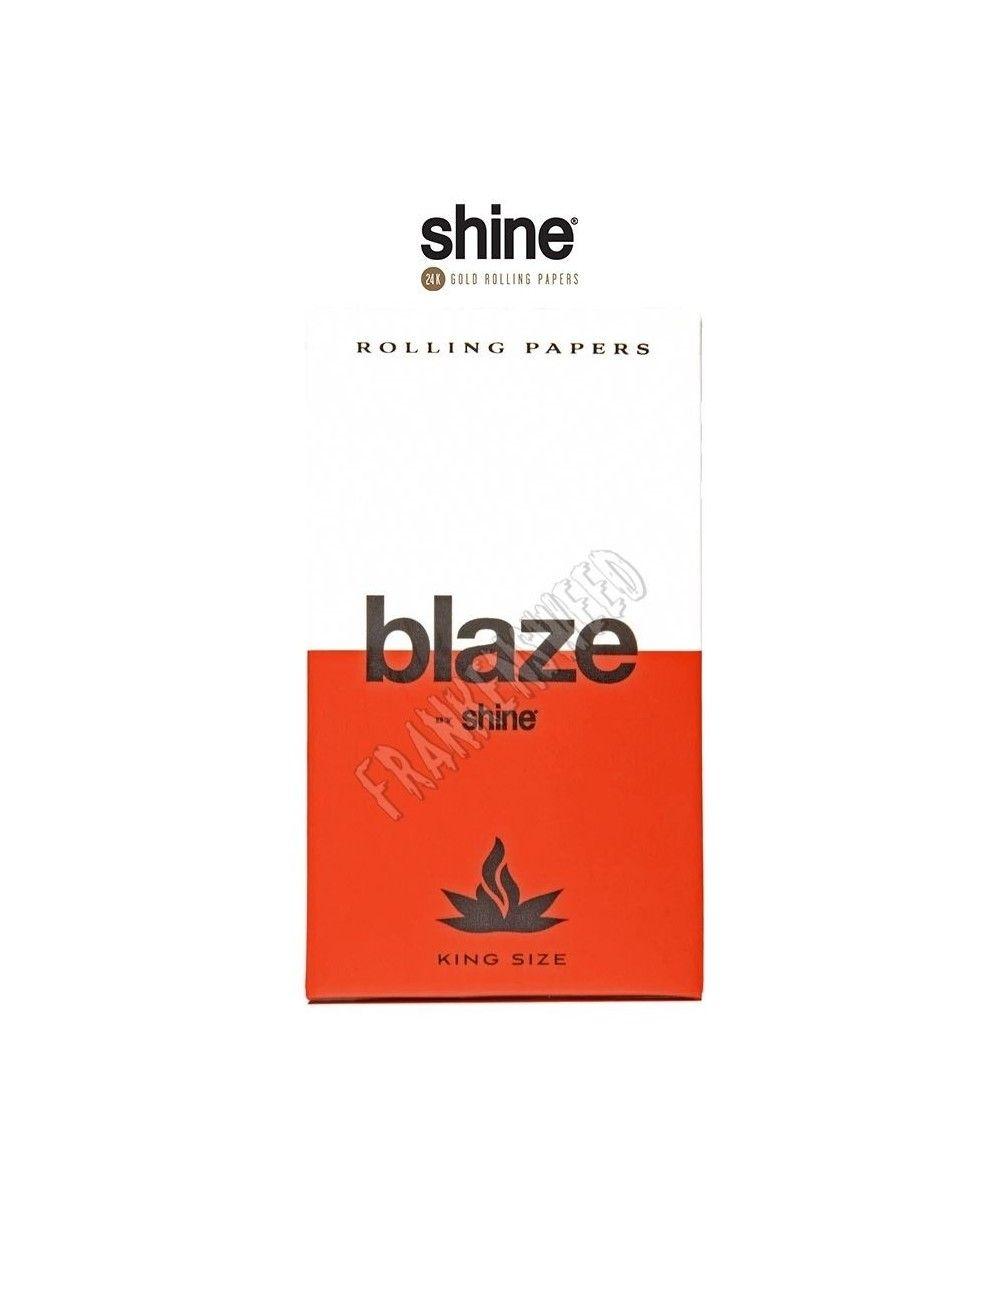 Comprar en España Blaze Hemp Rolling Papers by Shine, en Frankensweed Shop